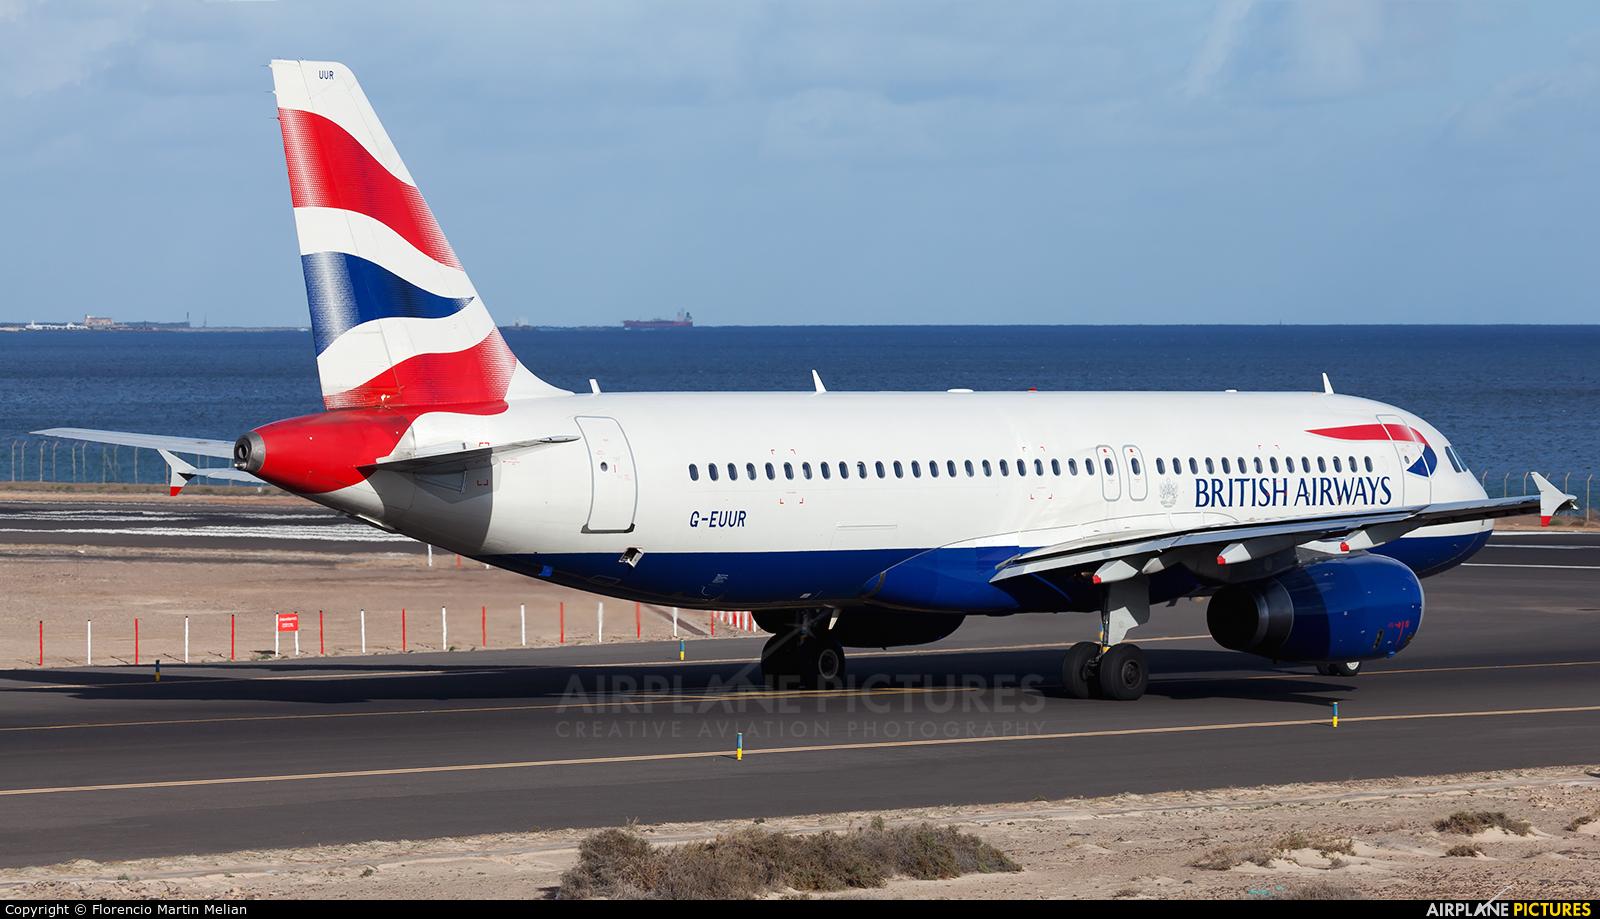 British Airways G-EUUR aircraft at Lanzarote - Arrecife